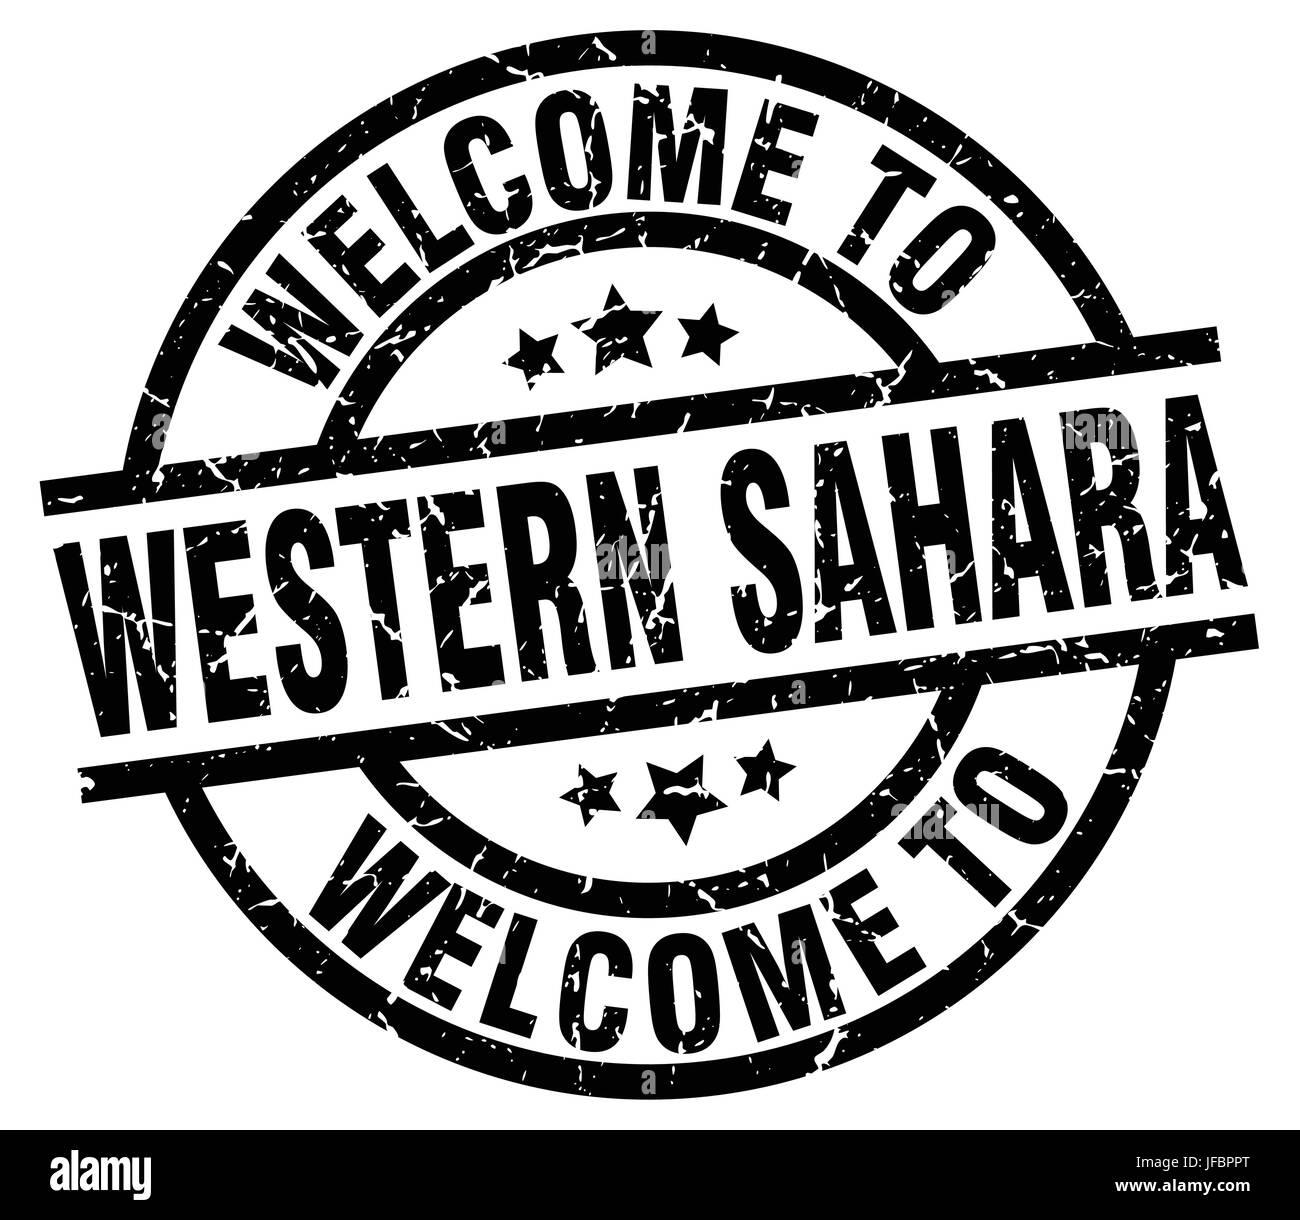 welcome to Western Sahara black stamp - Stock Image